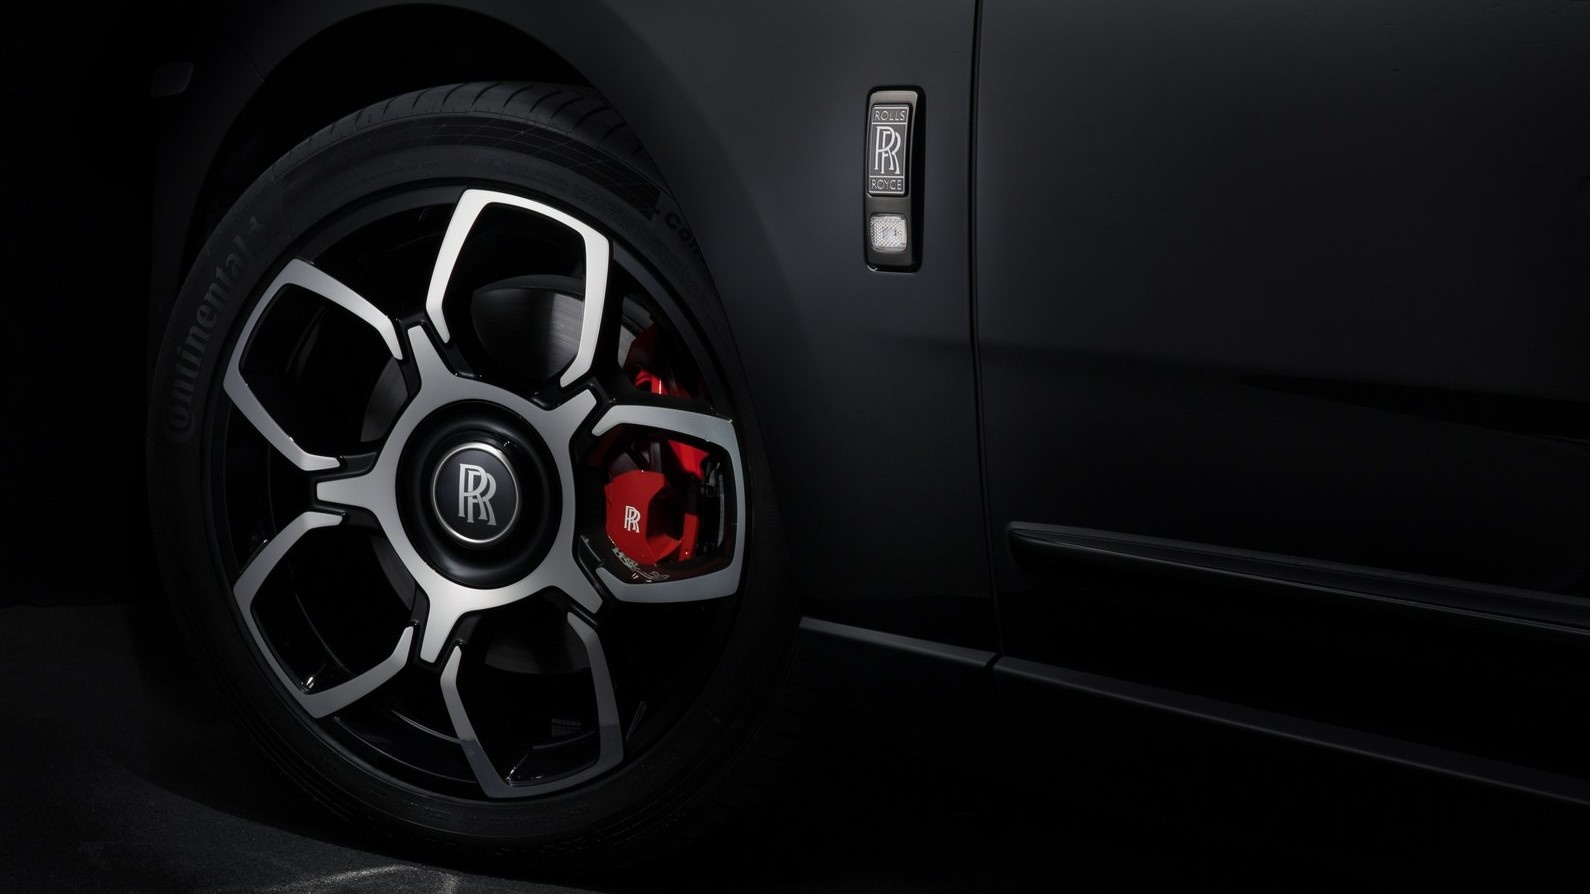 SUV sieu sang cua Rolls-Royce ban dac biet Black Badge ra mat hinh anh 8